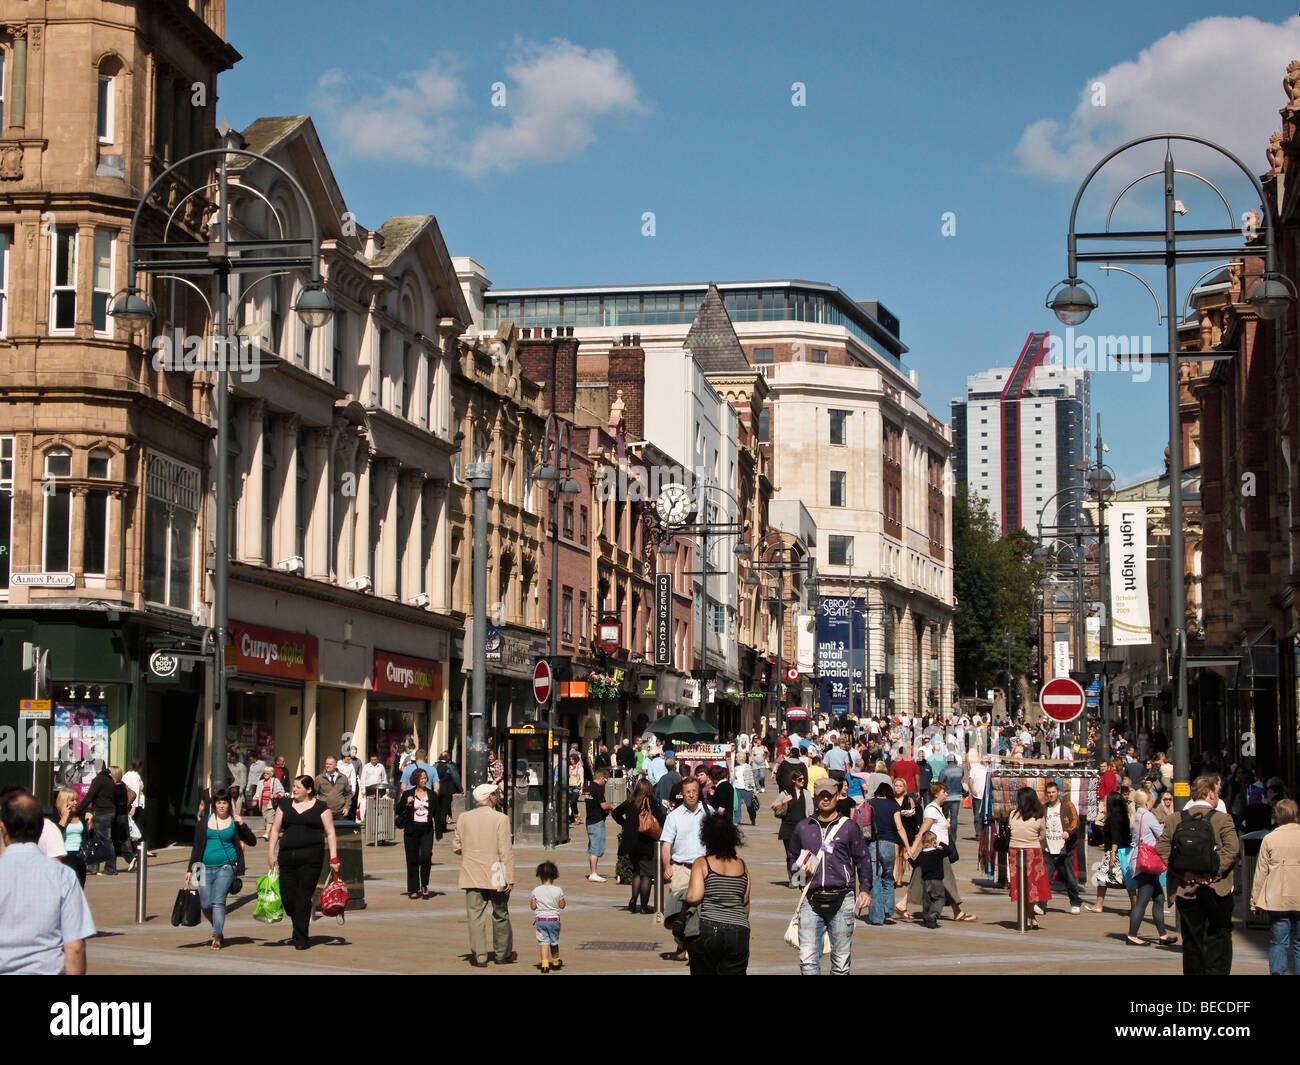 Briggate main shopping street in Leeds UK on summer day - Stock Image